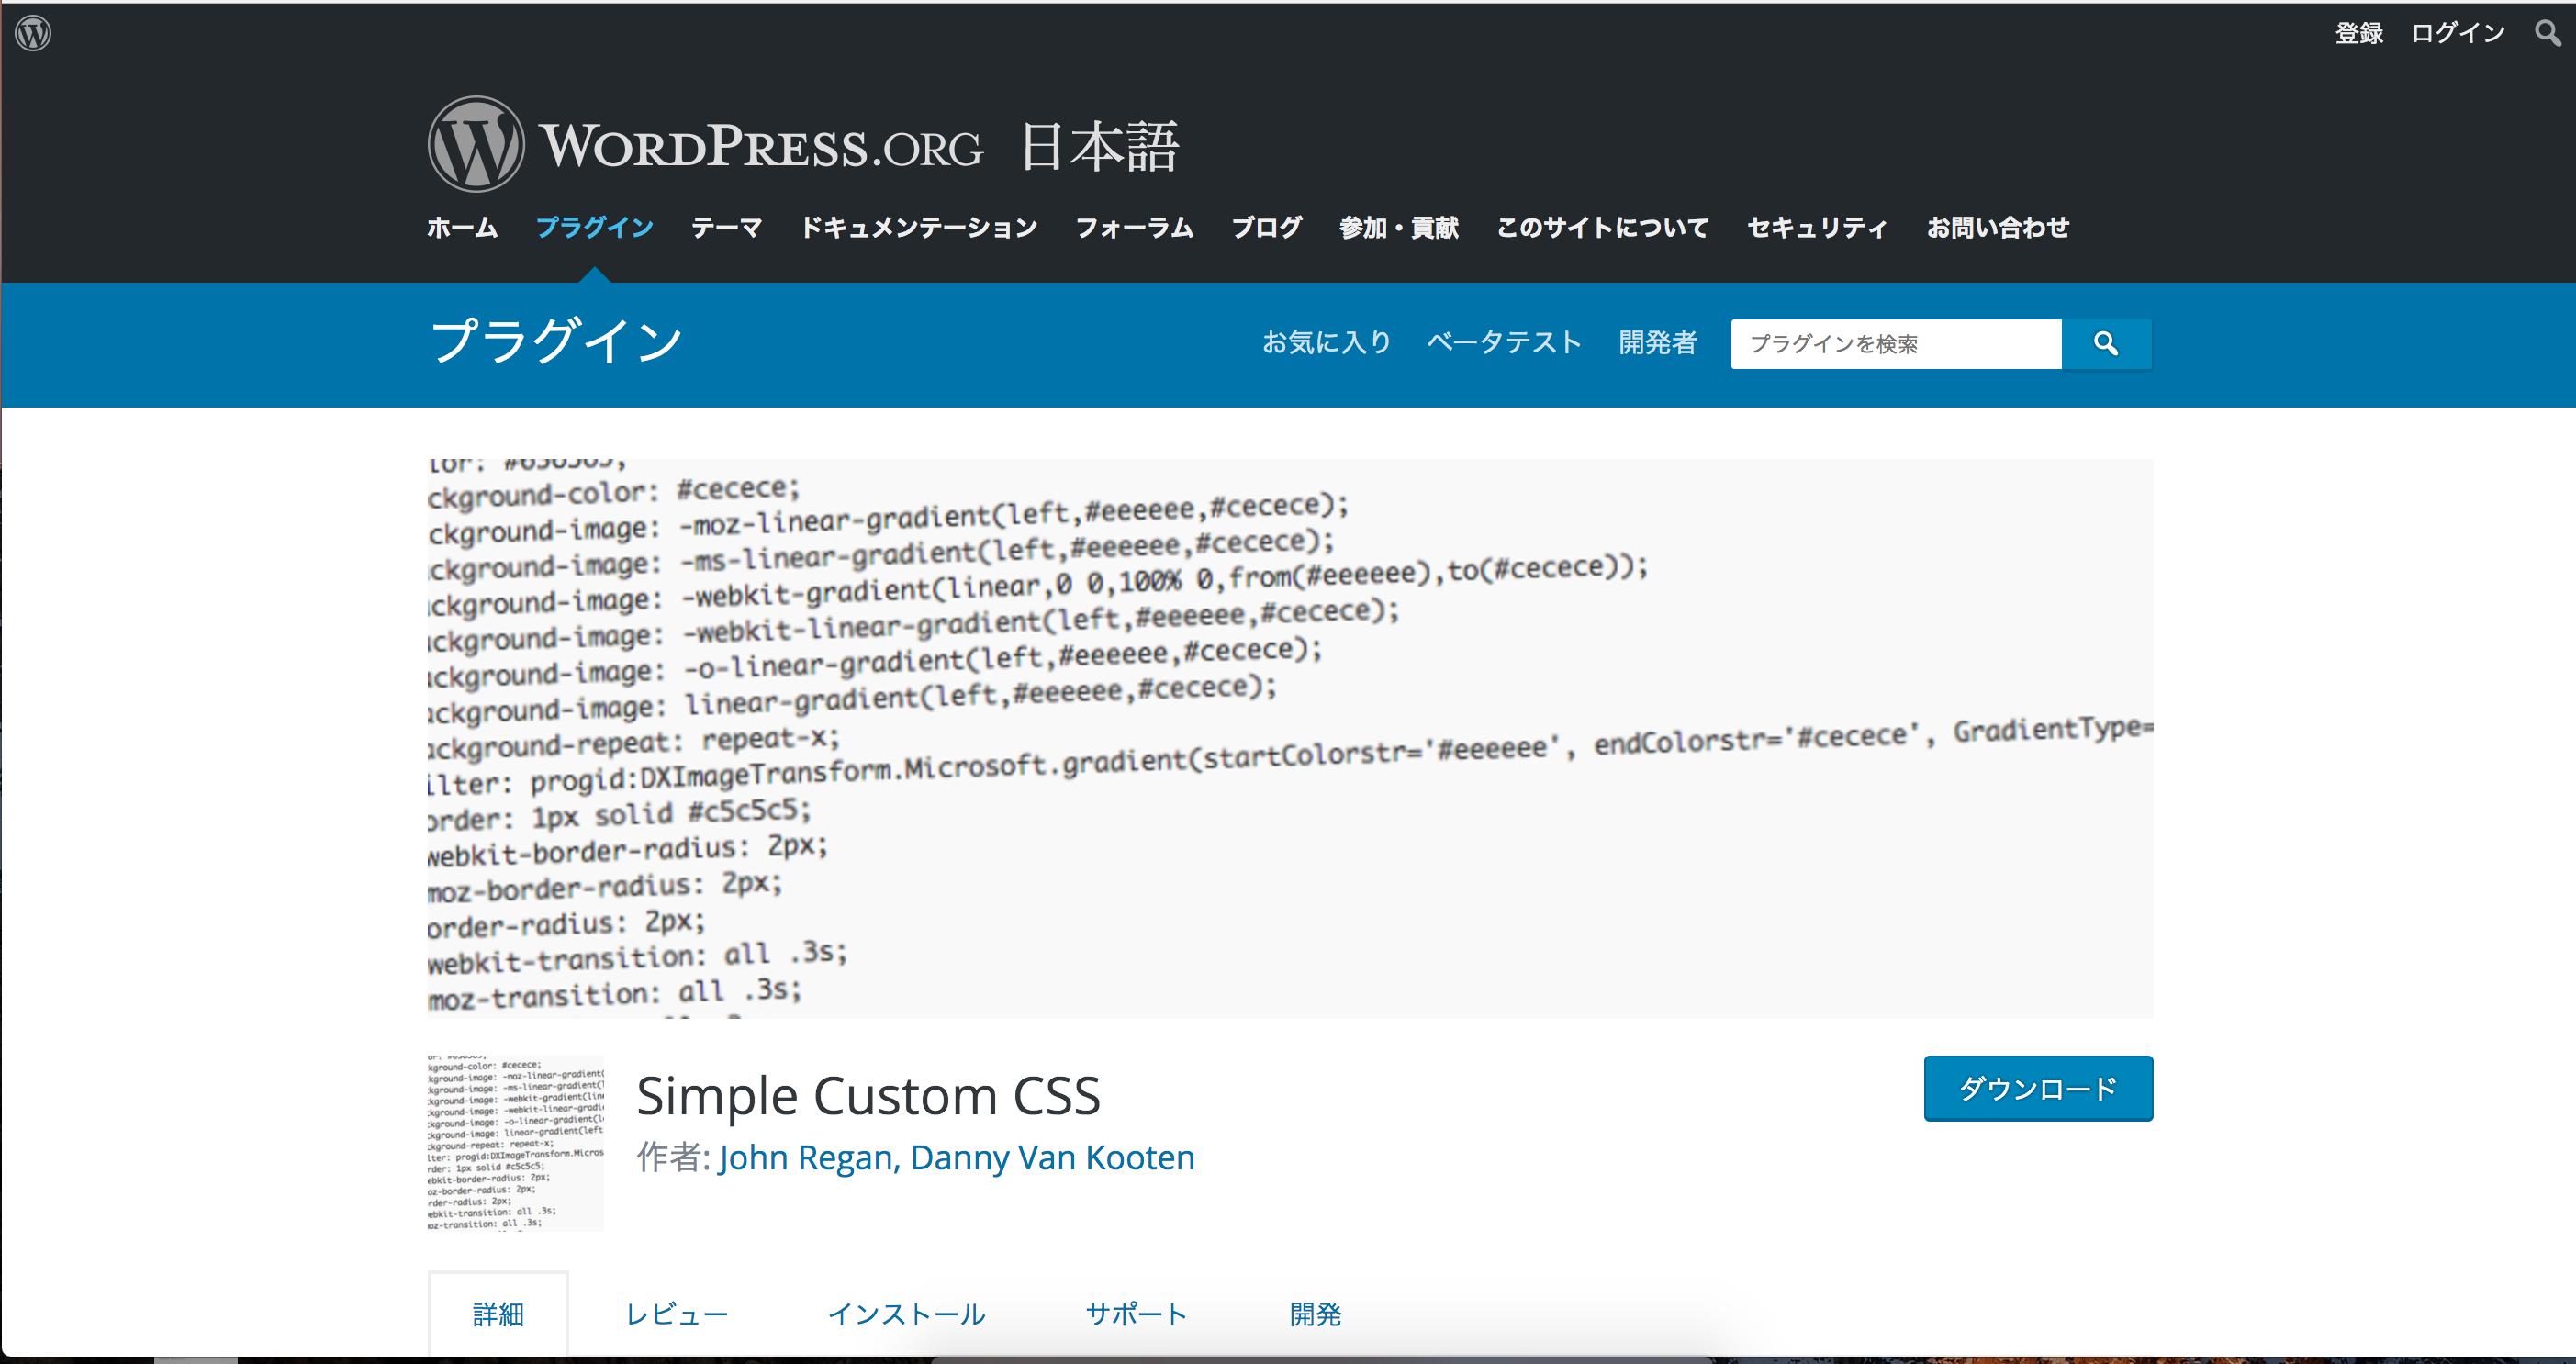 simple custom css - wordpressでCSSを編集!初心者がレスポンシブデザインを作るための方法まとめ